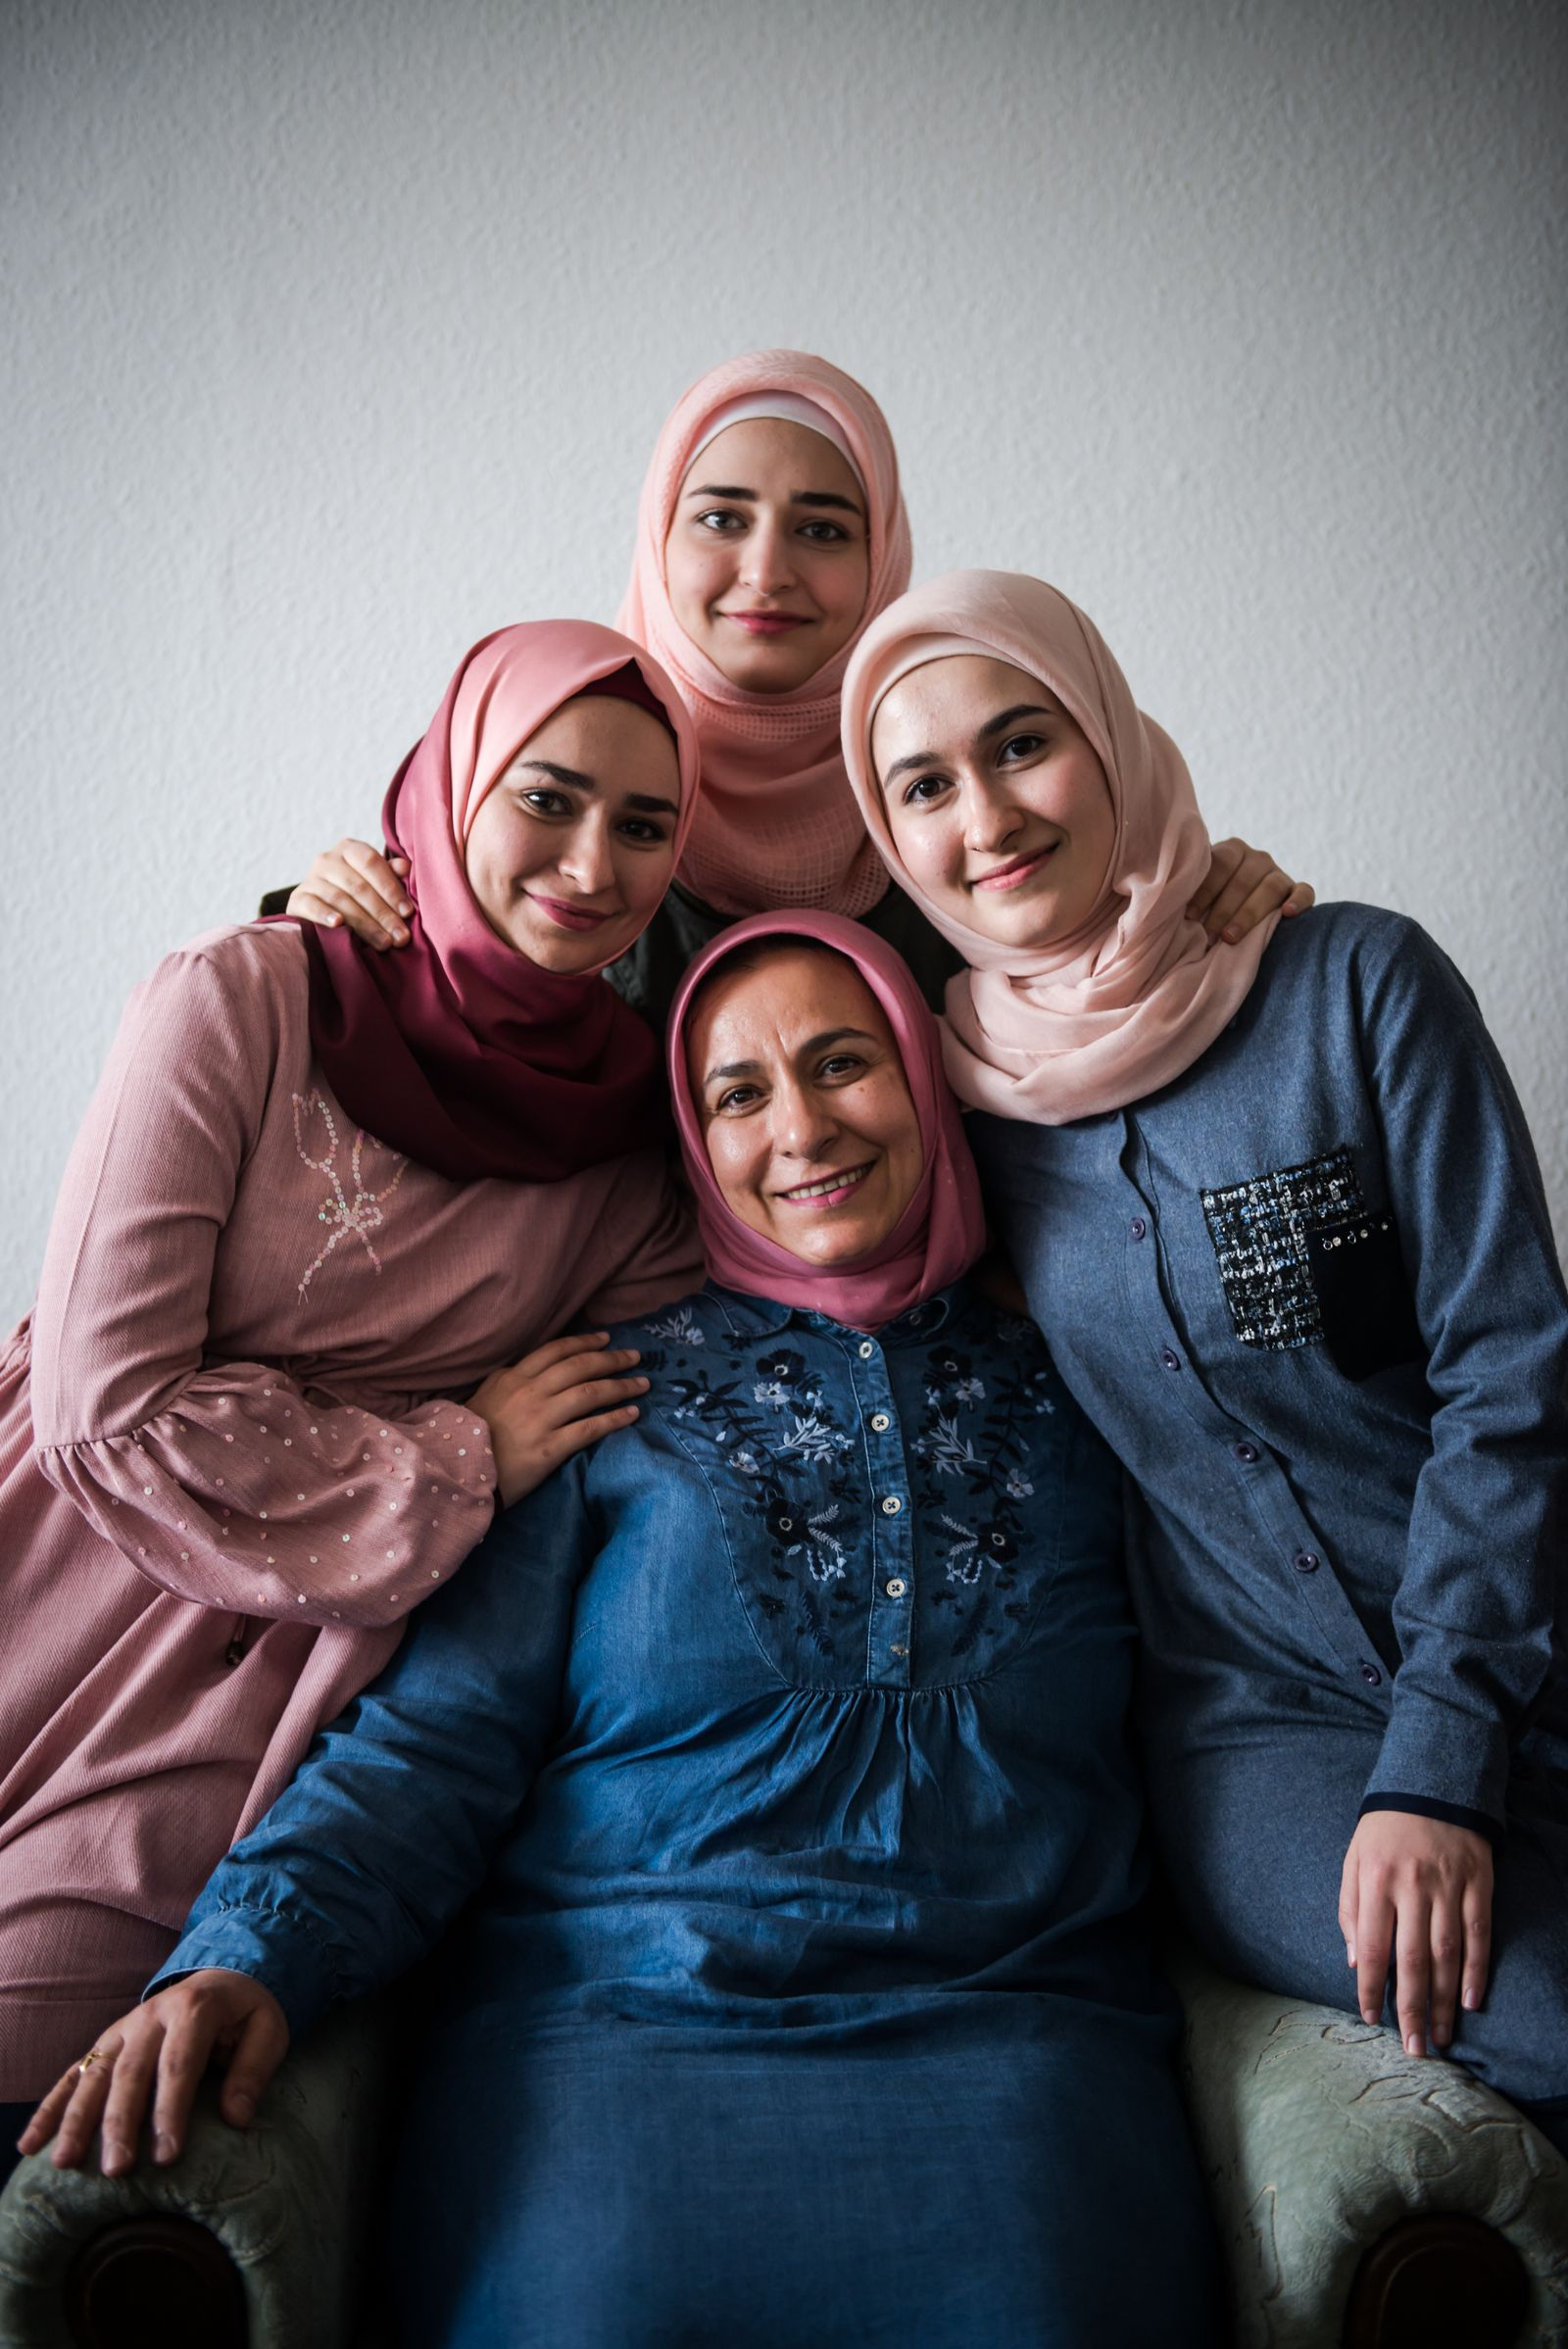 EINMALIGE VERWENDUNG SPIN SP 42/2019 S. 53 refugees career Alyousef